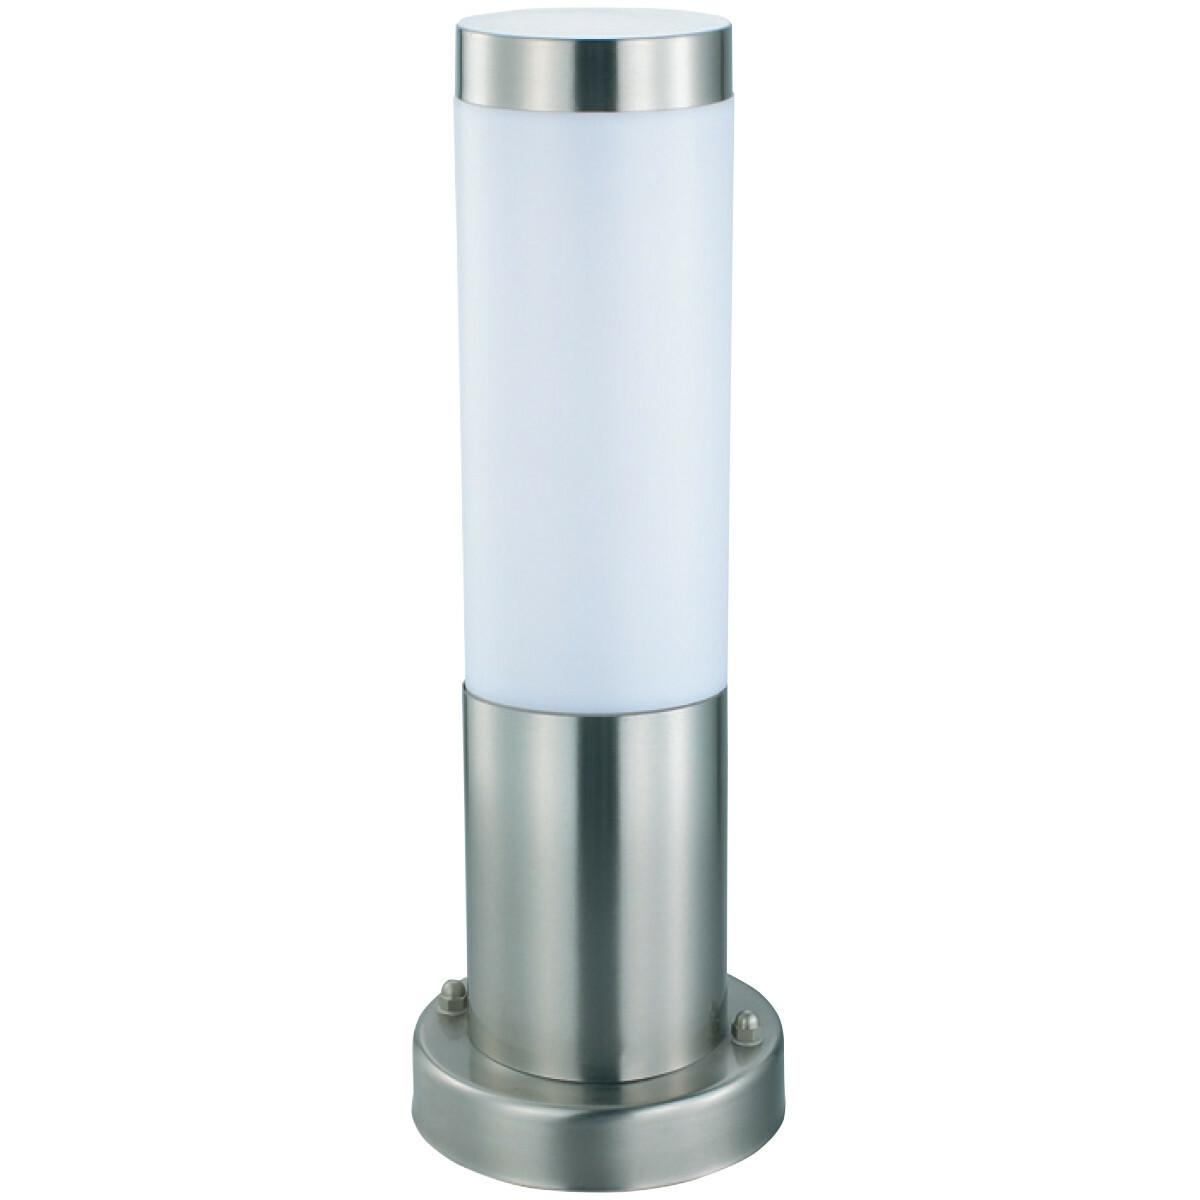 PHILIPS - LED Tuinverlichting - Staande Buitenlamp - CorePro LEDbulb 827 A60 - Laurea 3 - E27 Fittin